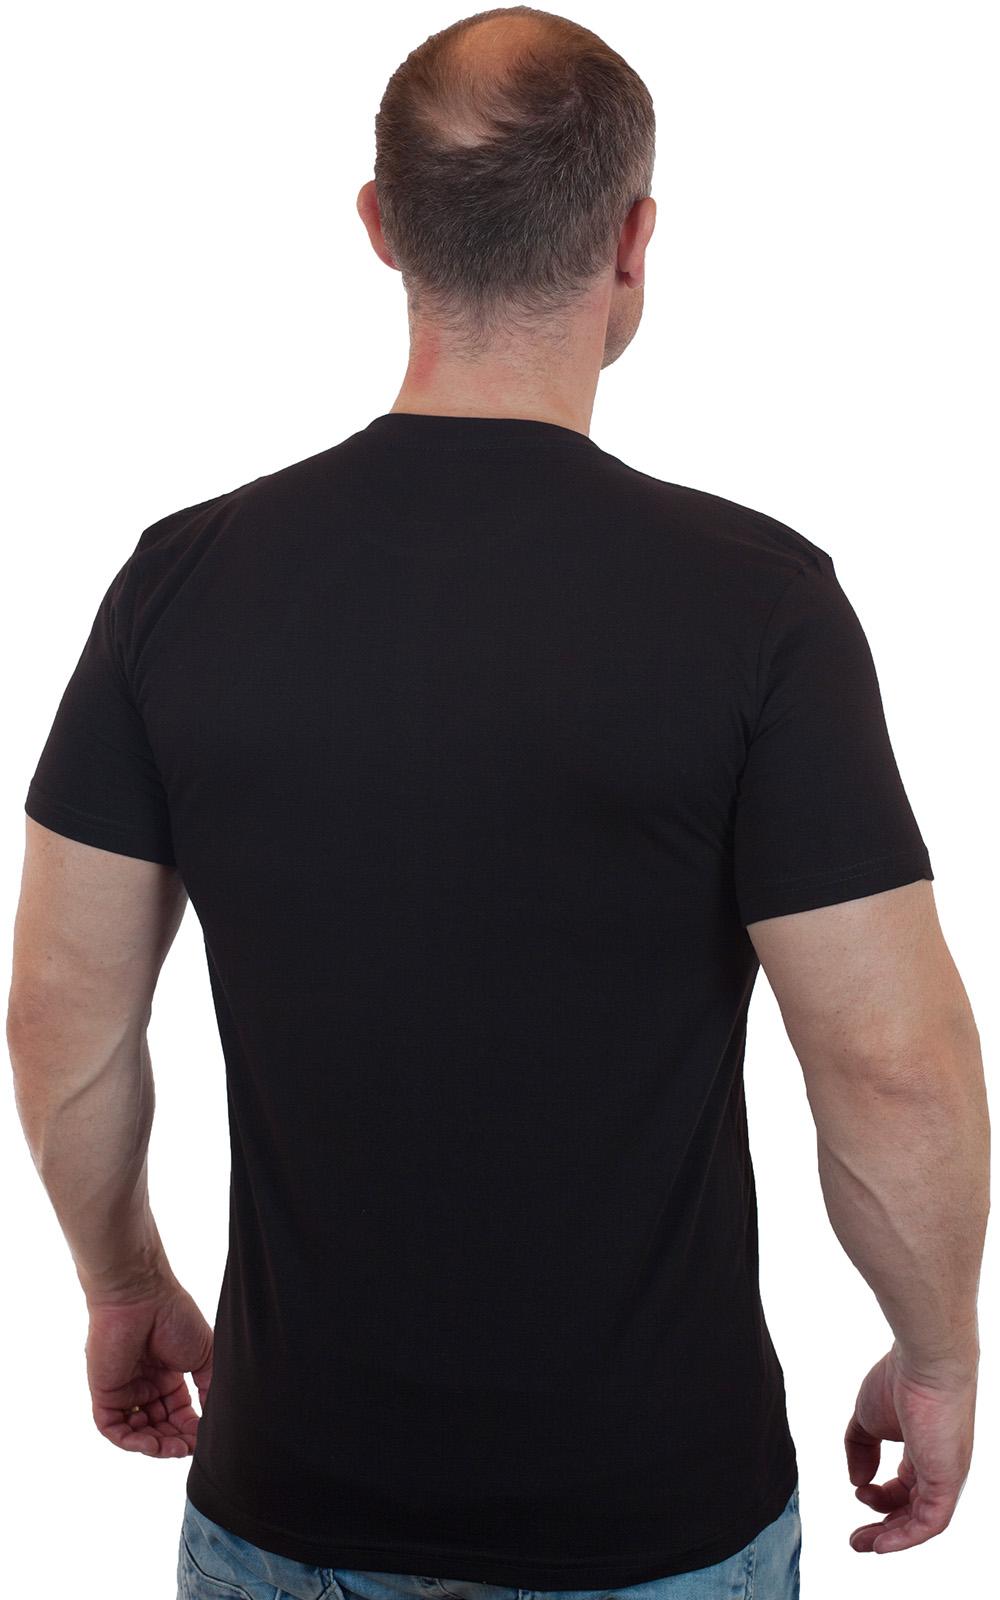 Стильная мужская футболка с флагом ЛНР